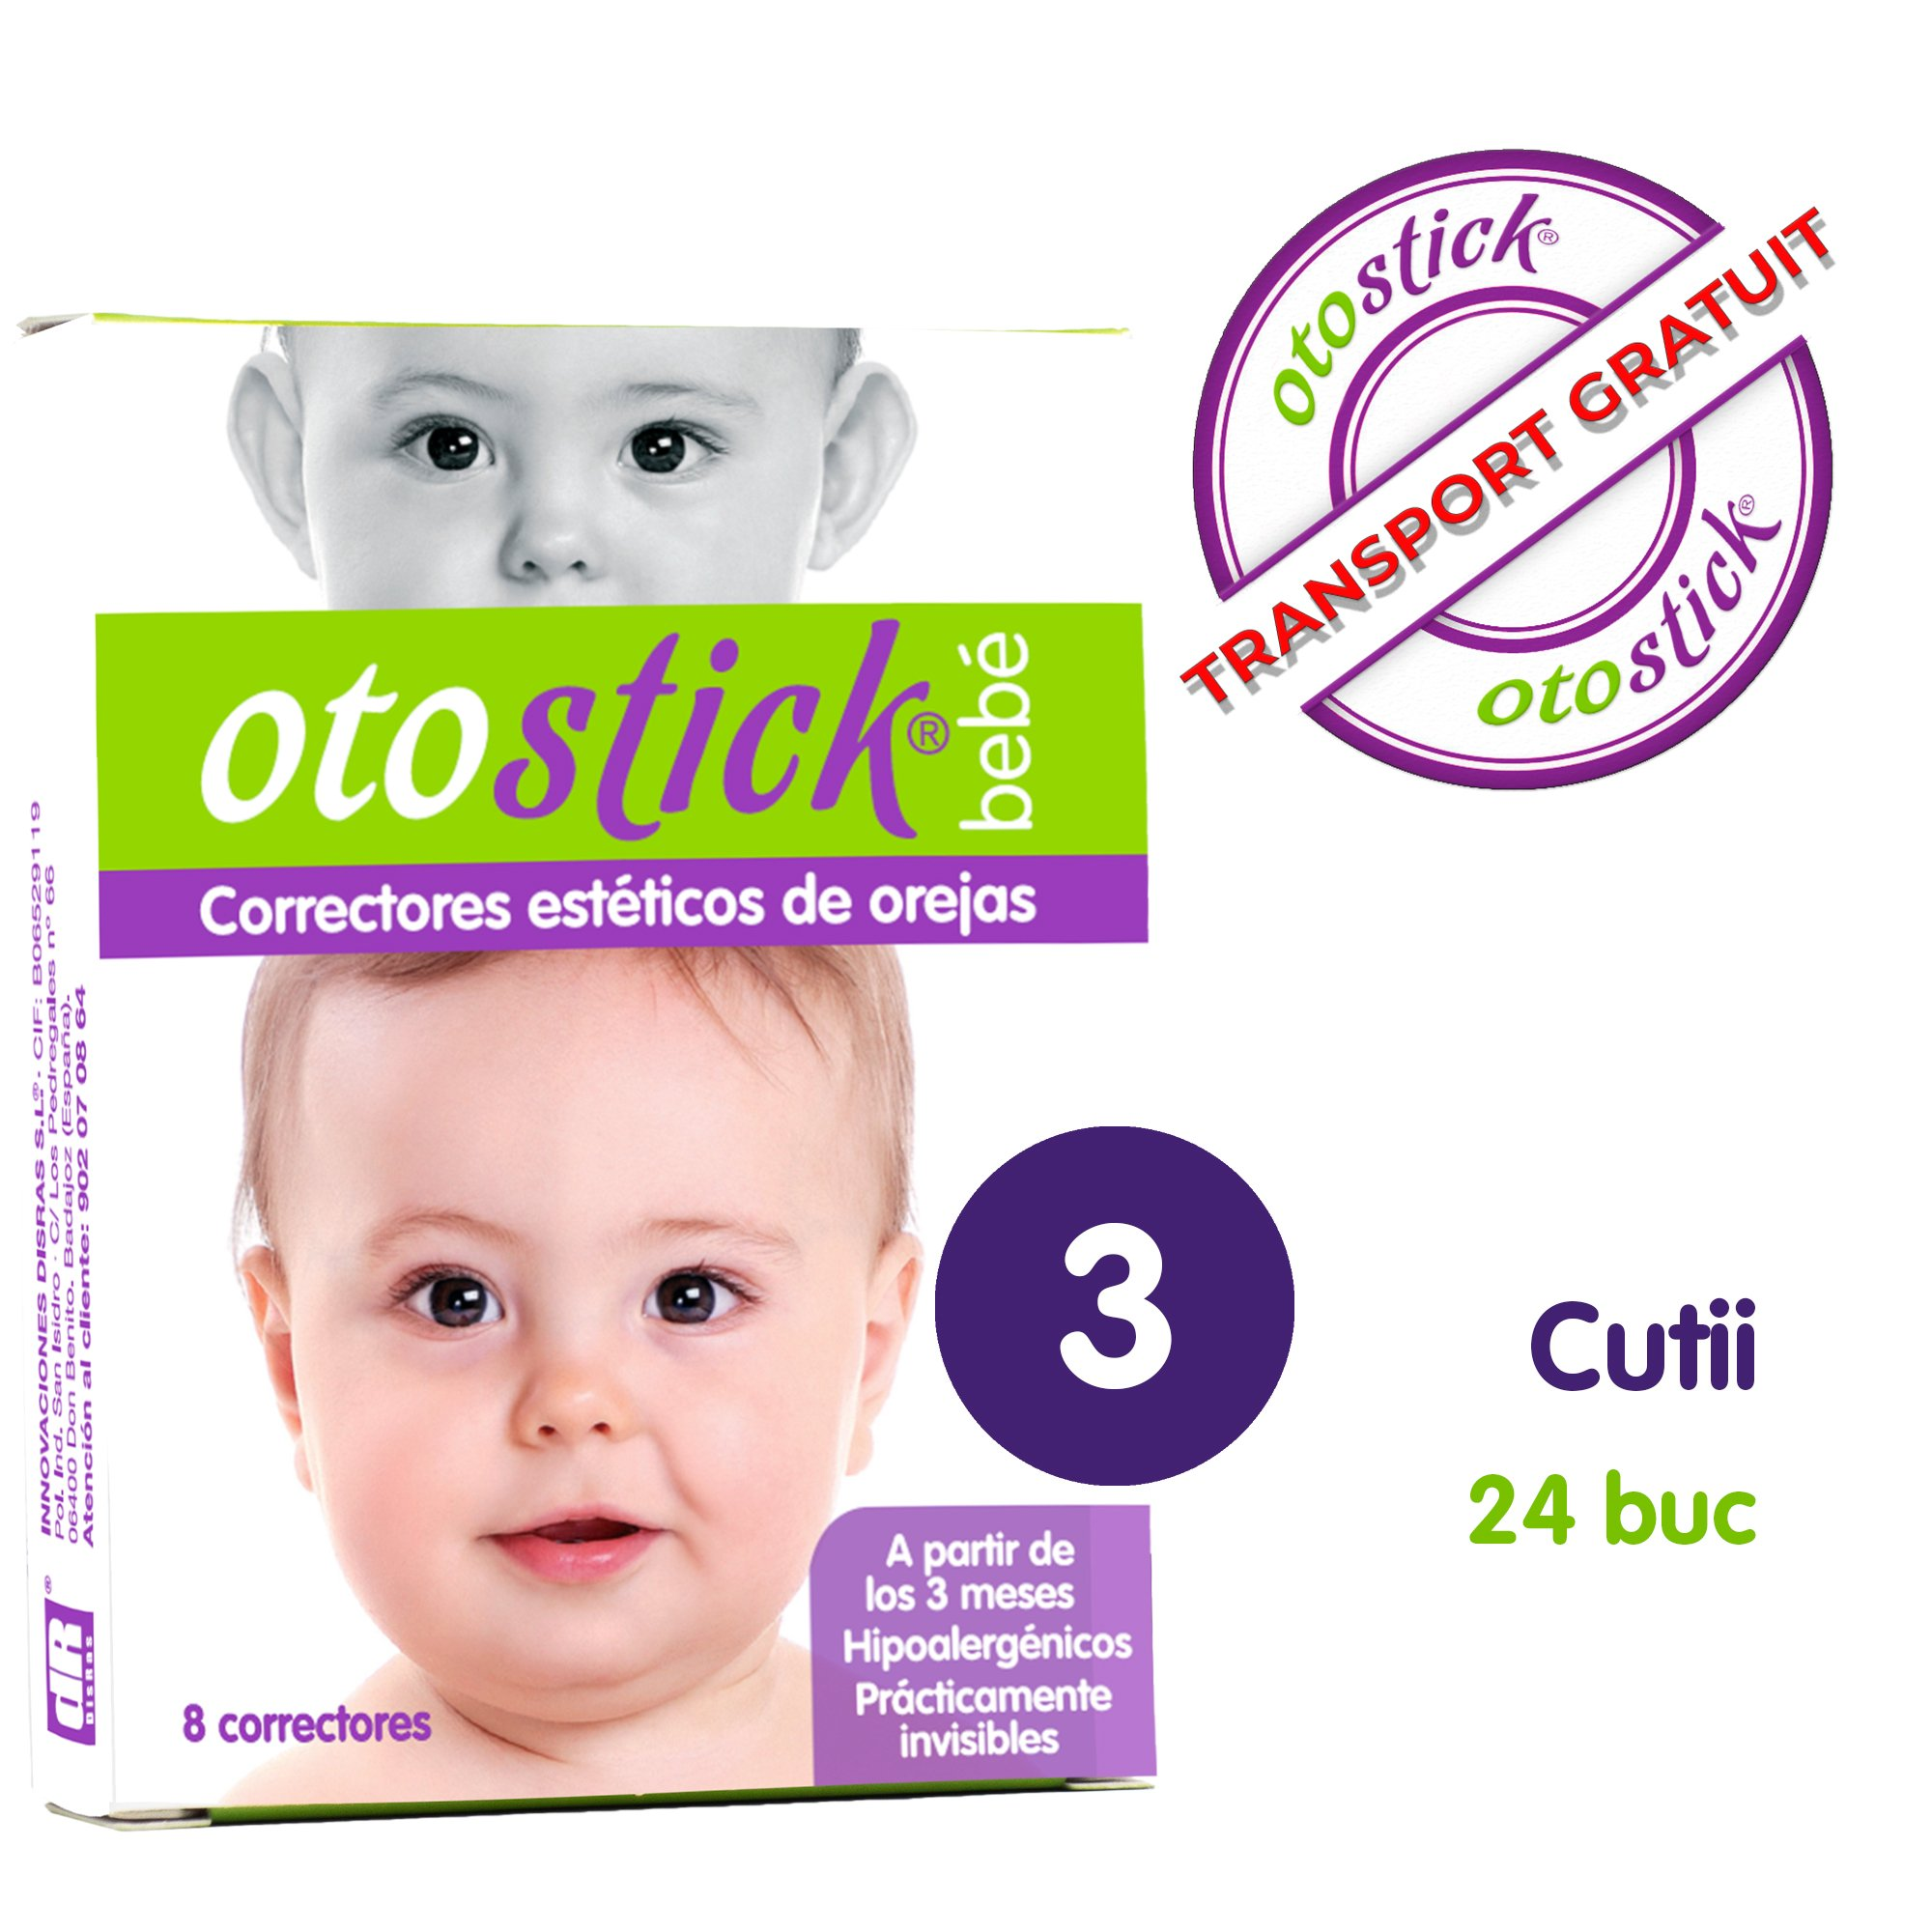 otostick-baby-3